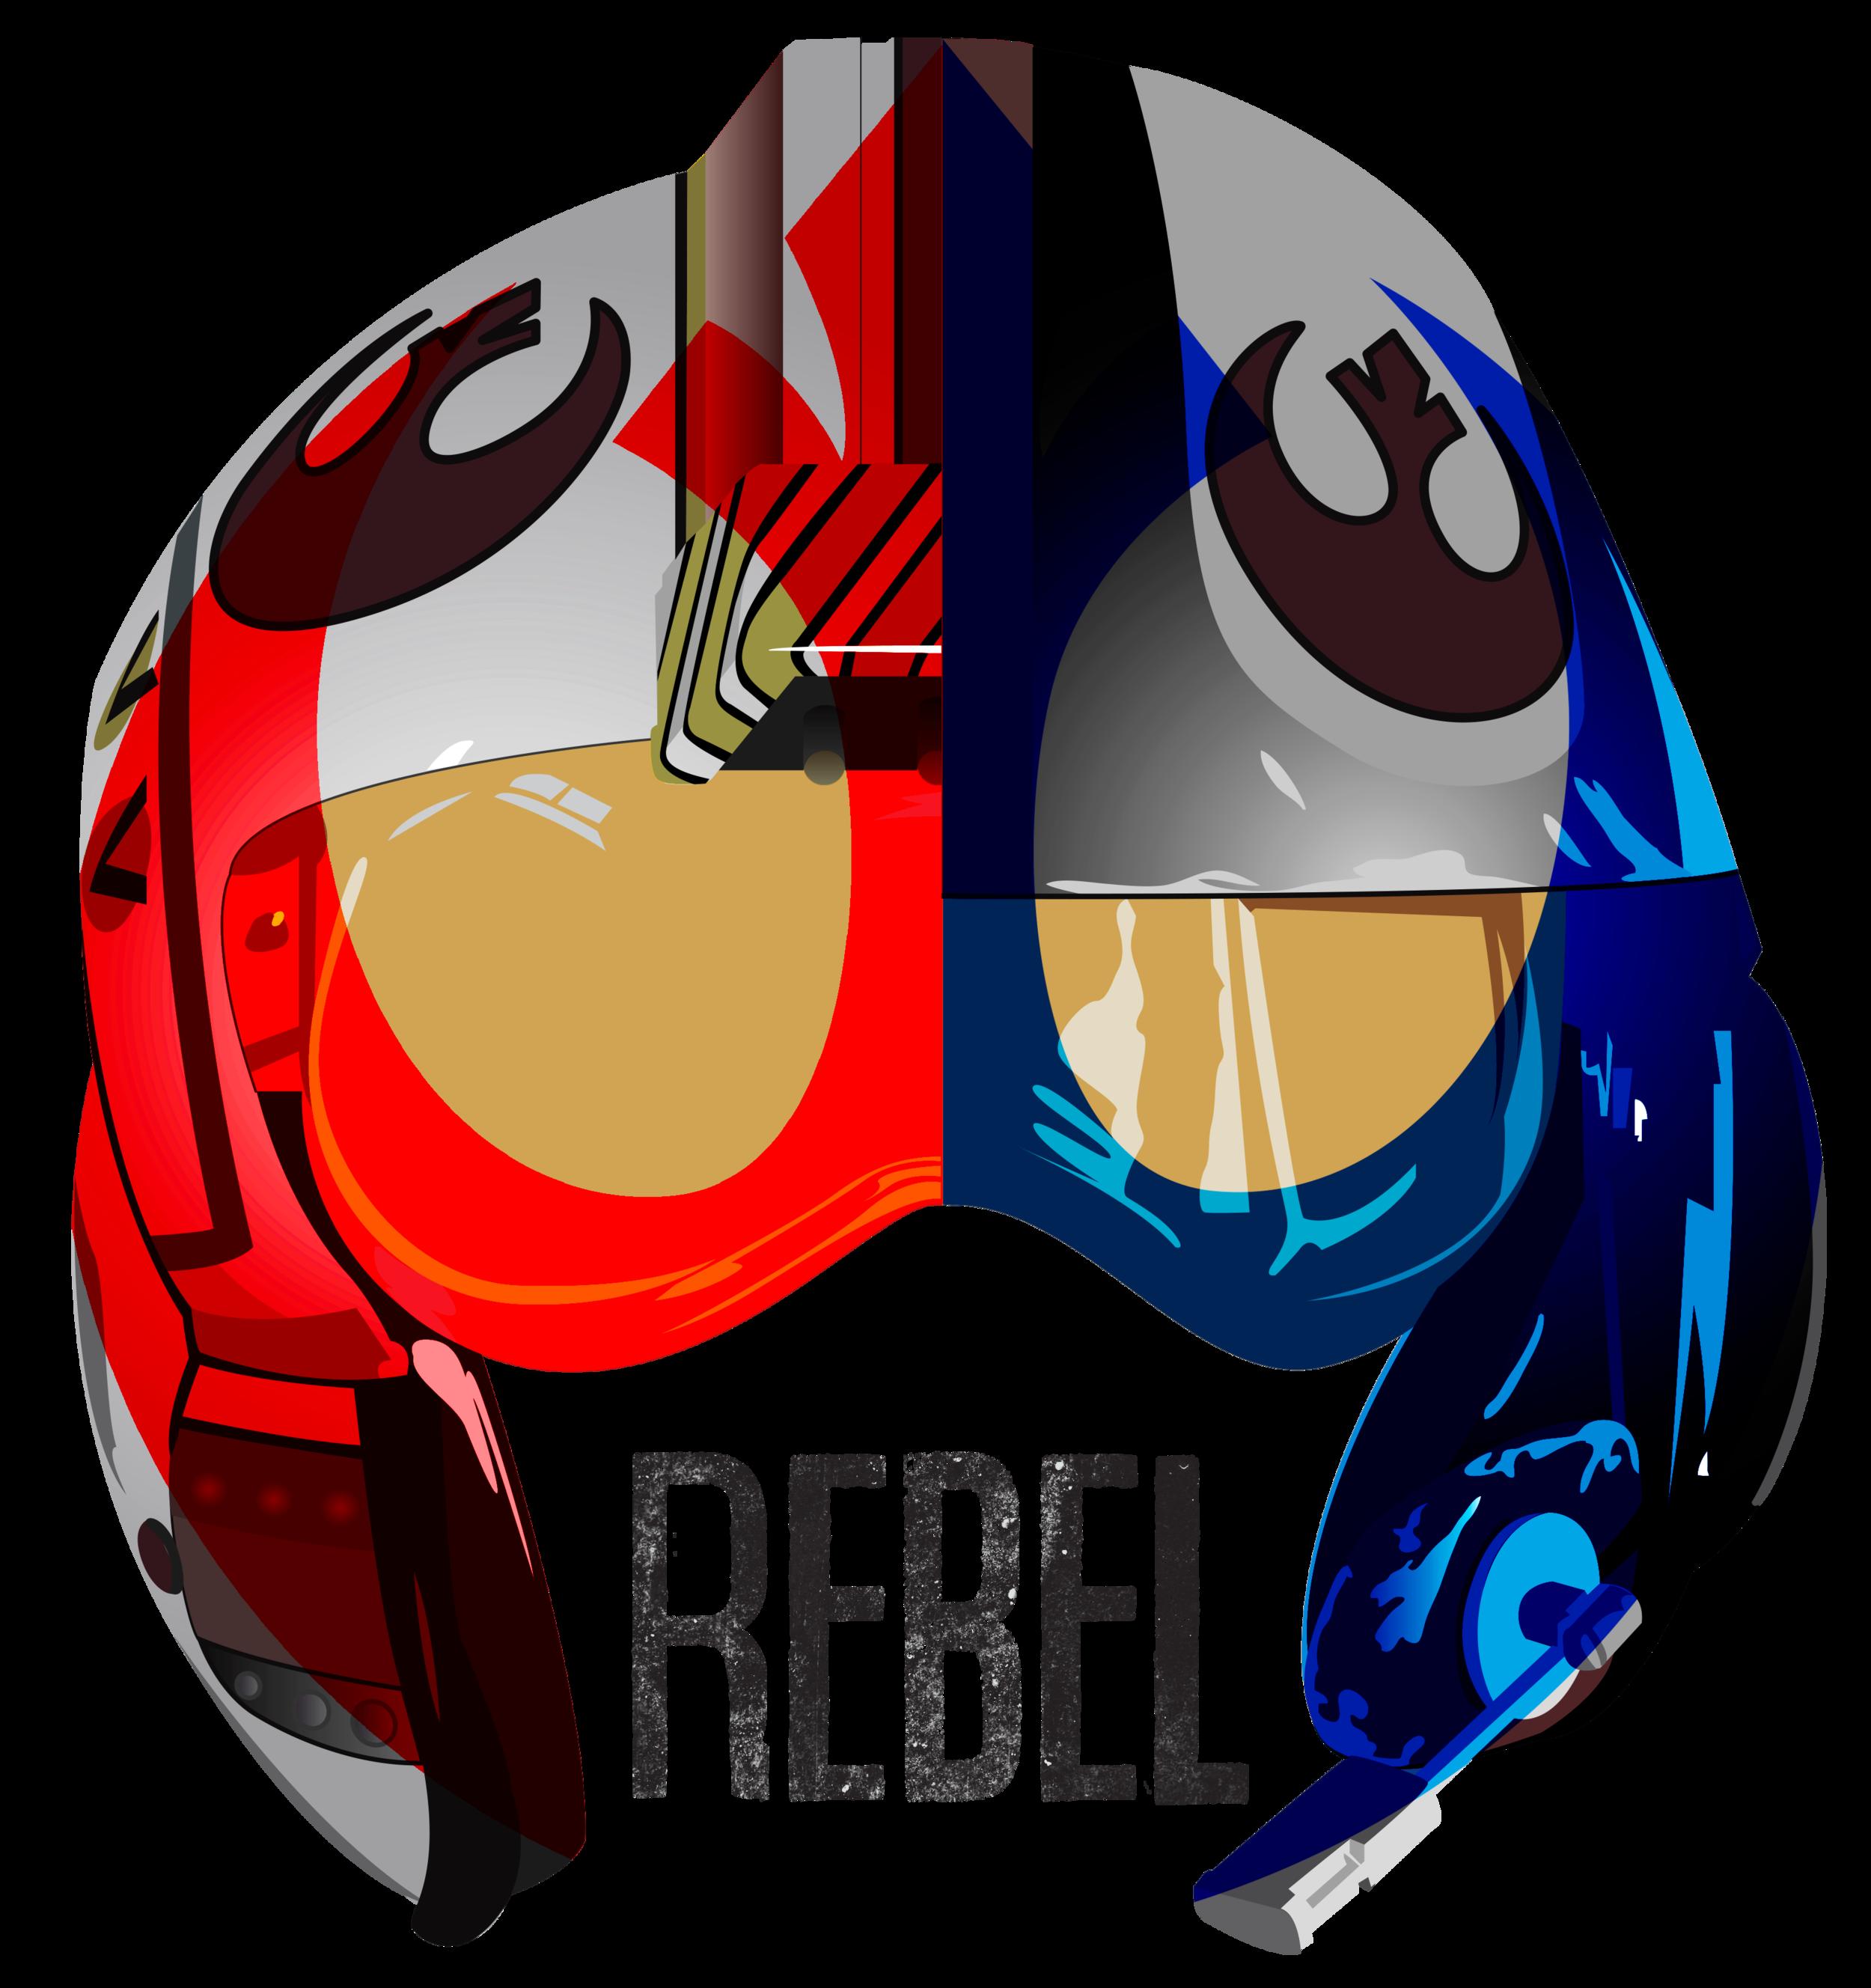 Old Rebel, New Resistance T-Shirt Design for - Teepublic